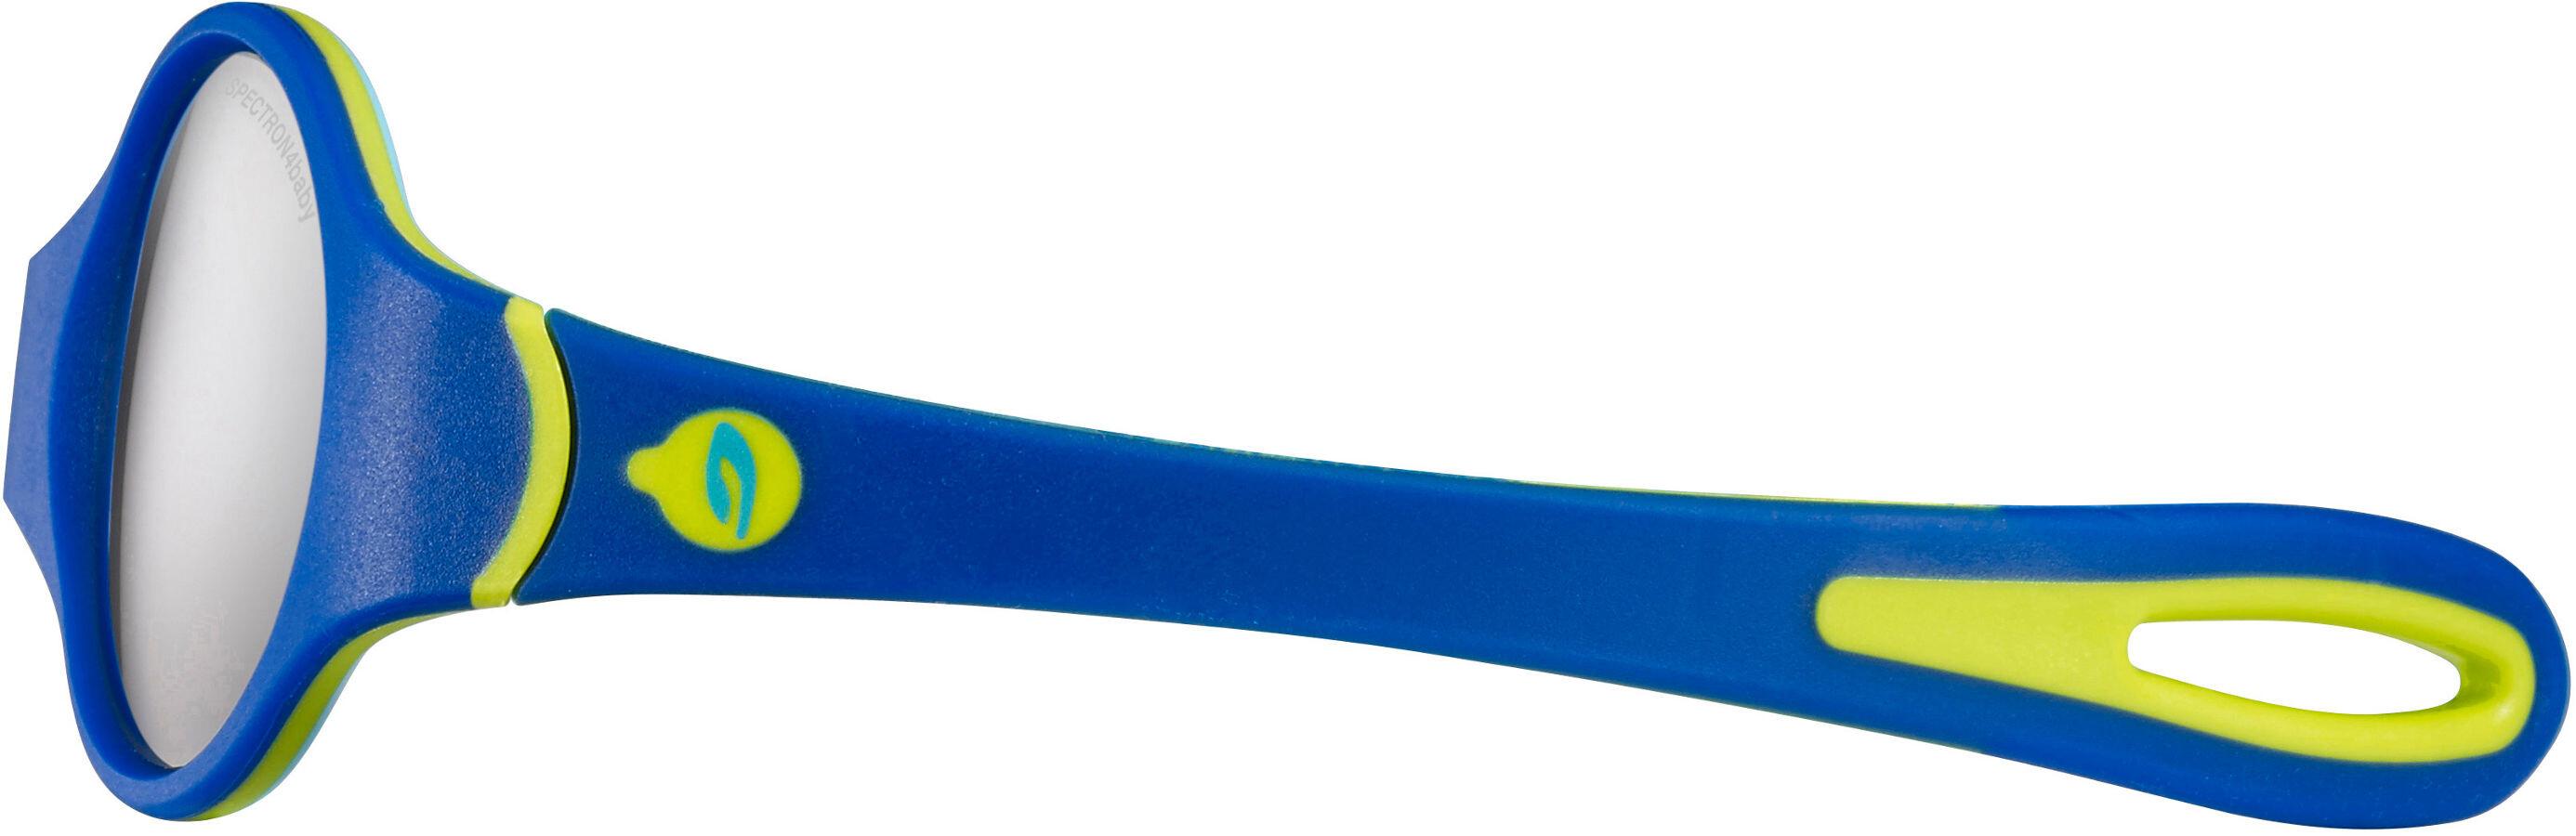 debfd3e5f721 Julbo Loop Spectron 4 Okulary Dzieci 2-4Y niebieski